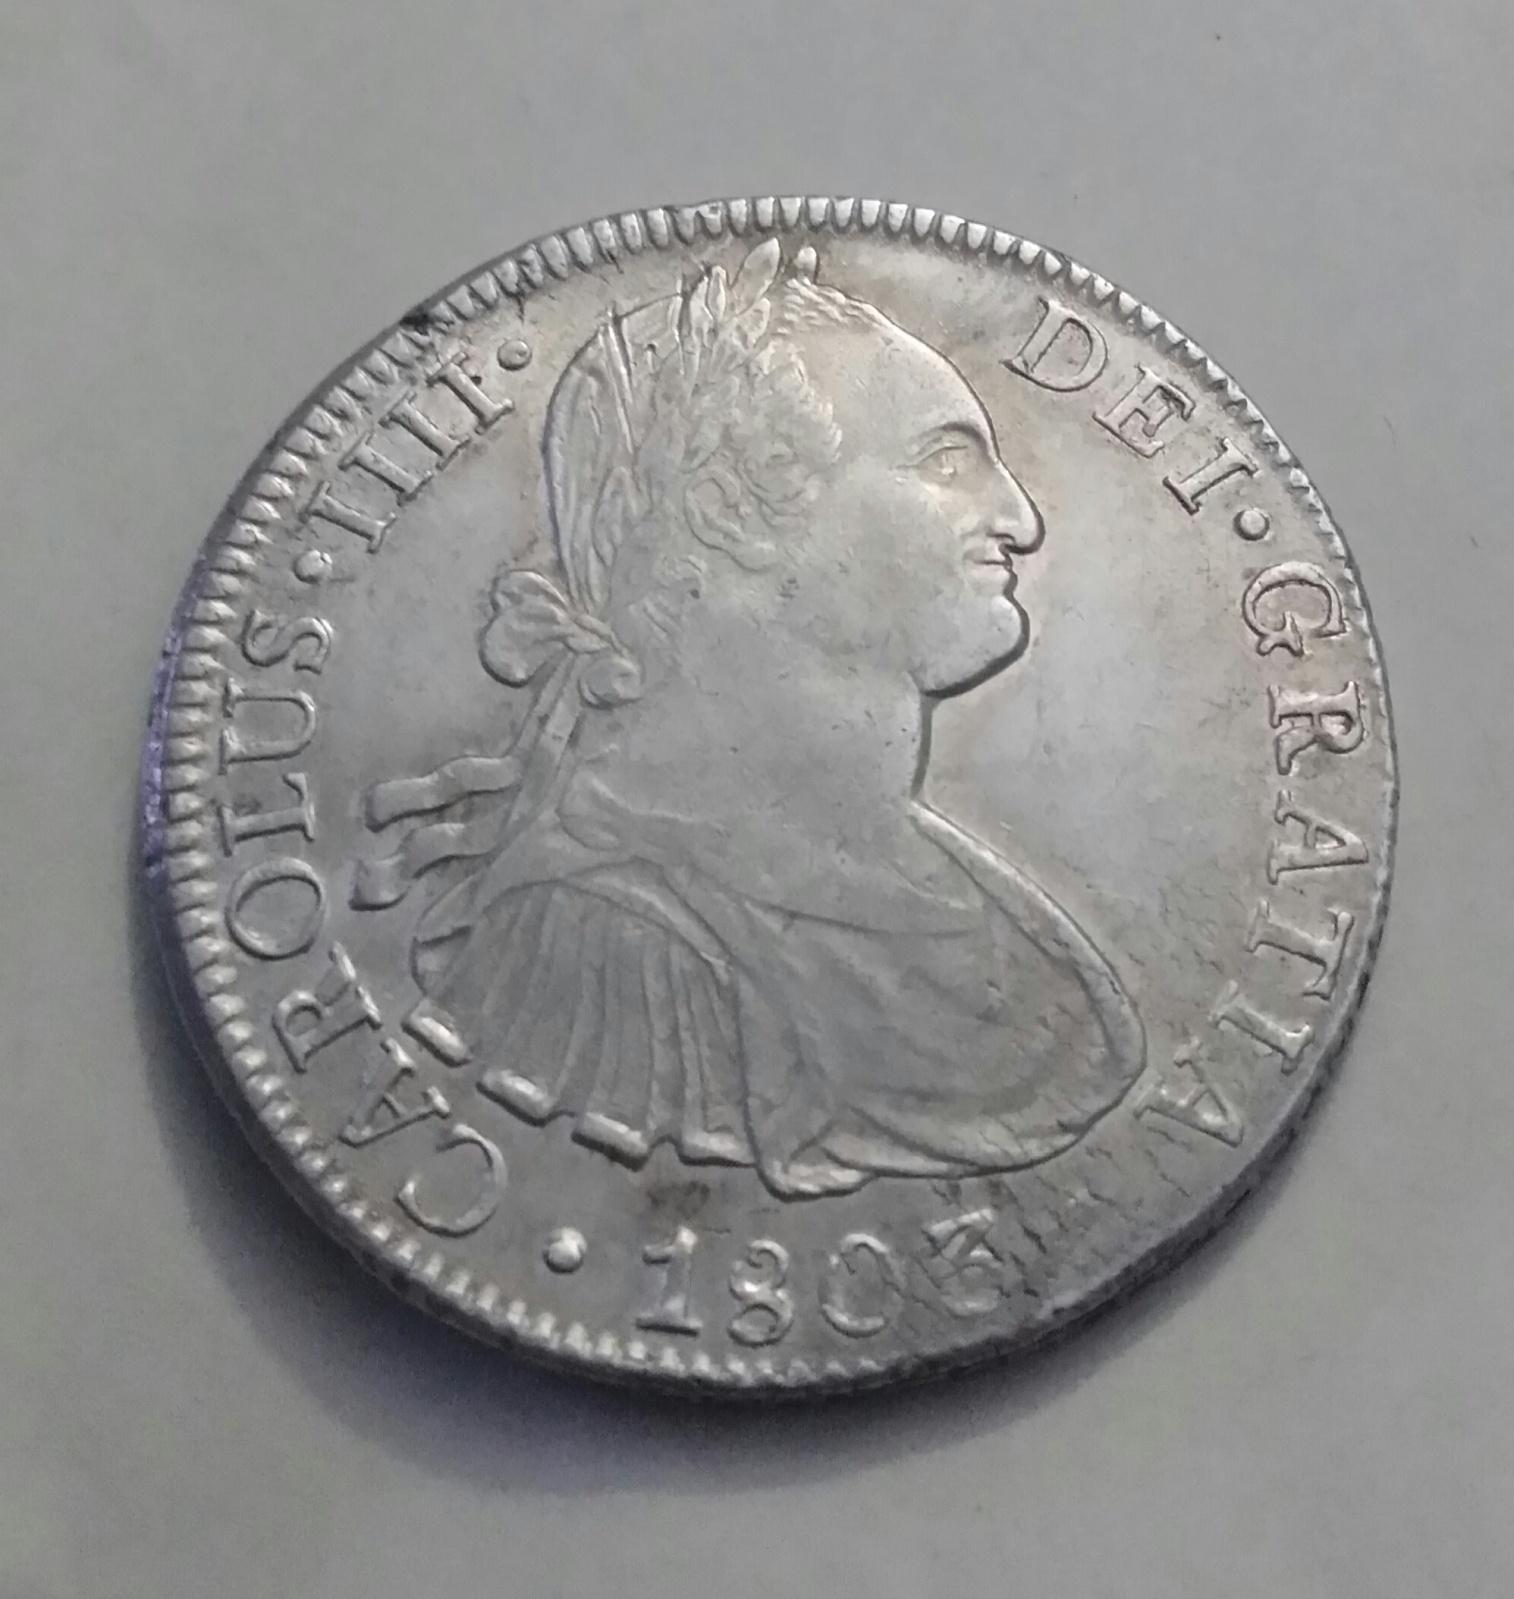 8 Reales Carolus IIII 1803 México FT 29l001x